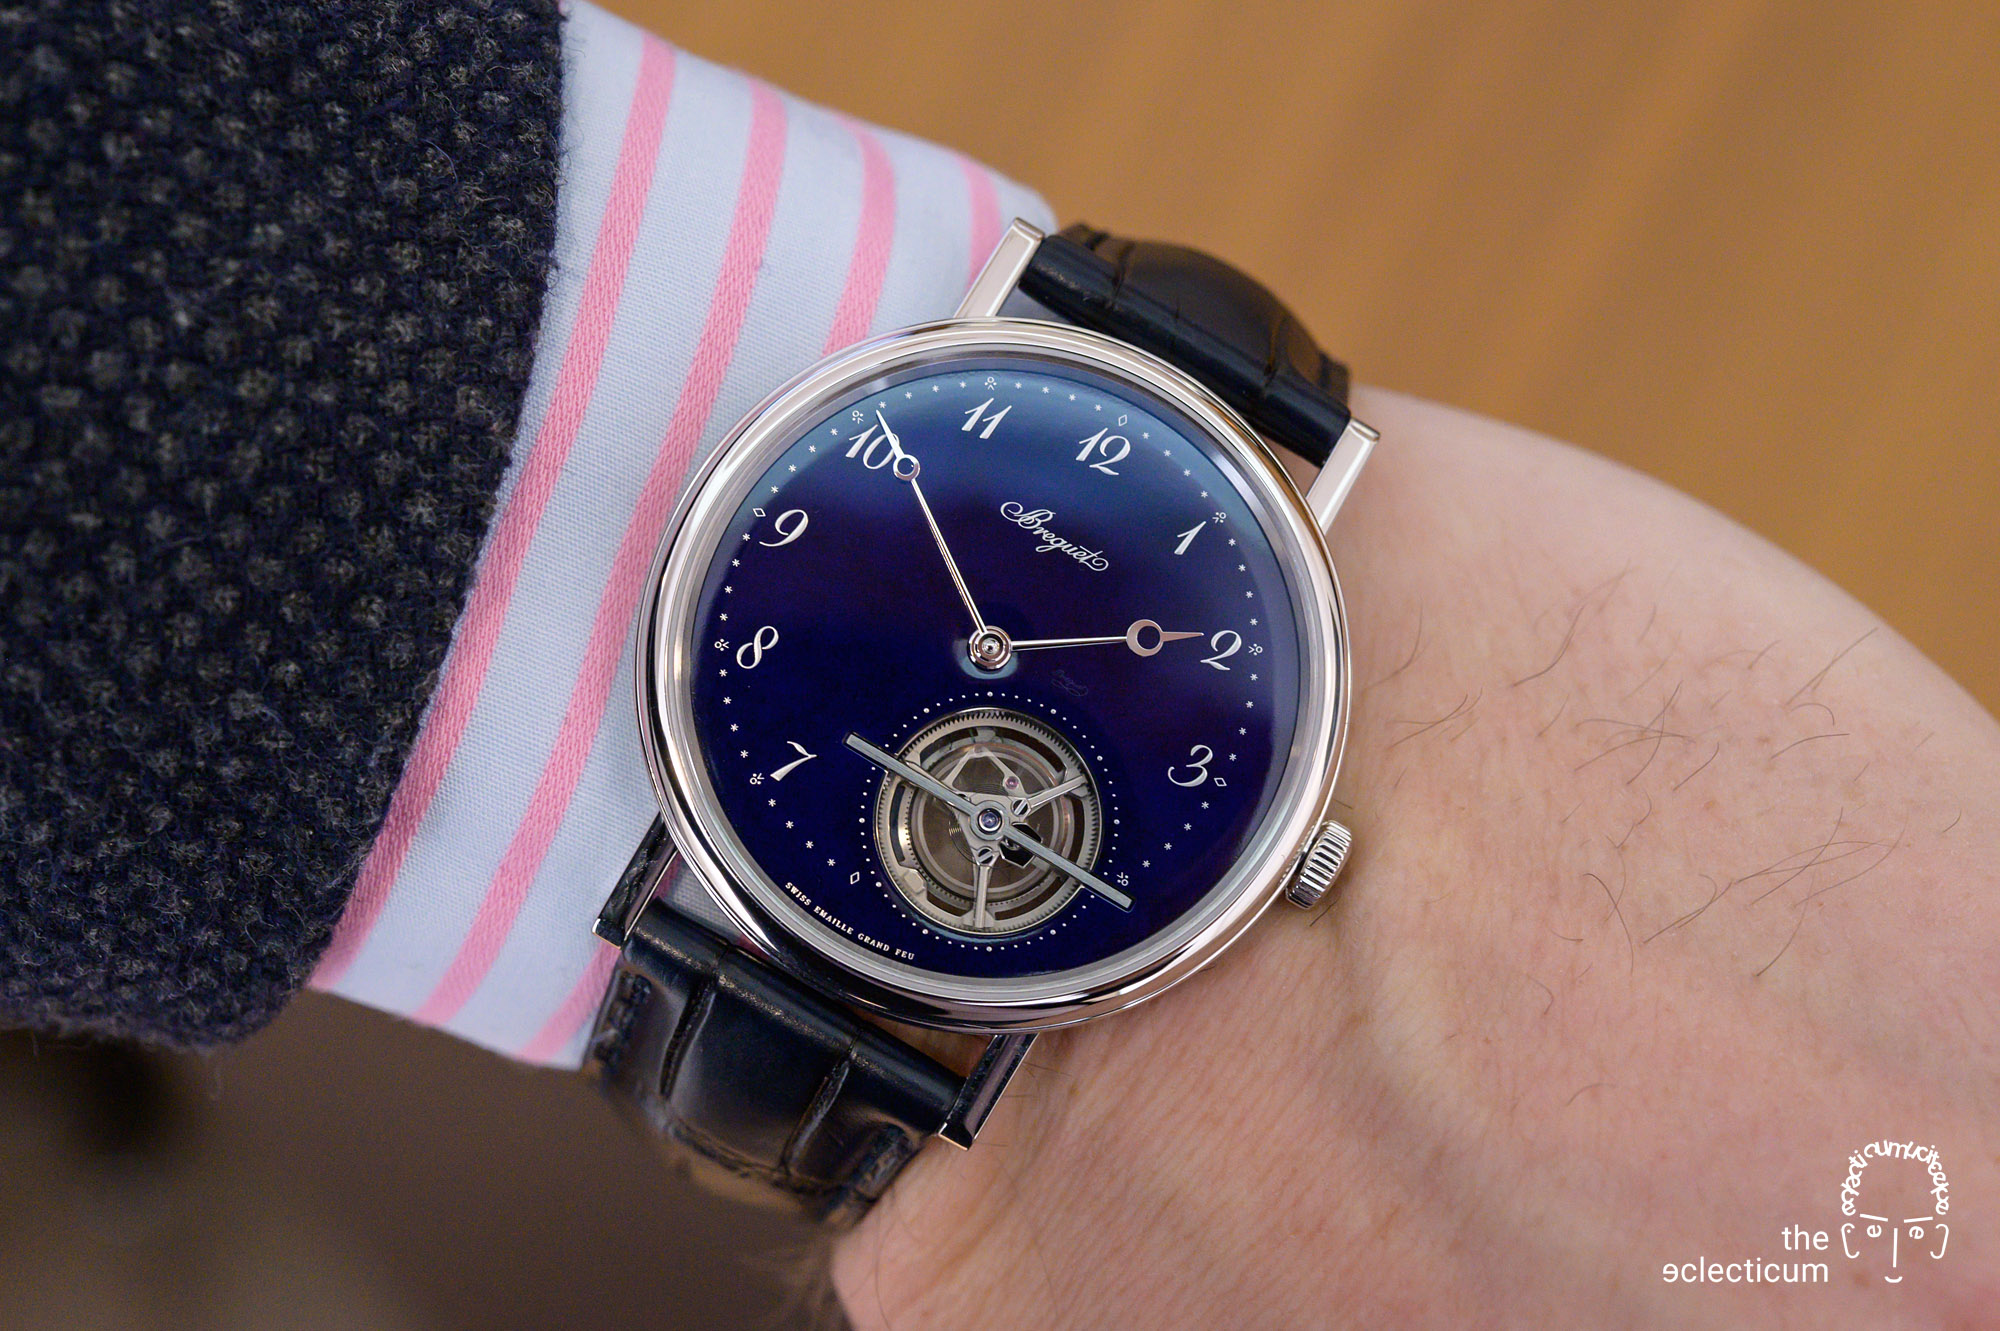 Breguet Classique Tourbillon Extra-Plat Blue Ref. 5367PT Grand Feu Enamel wristshot